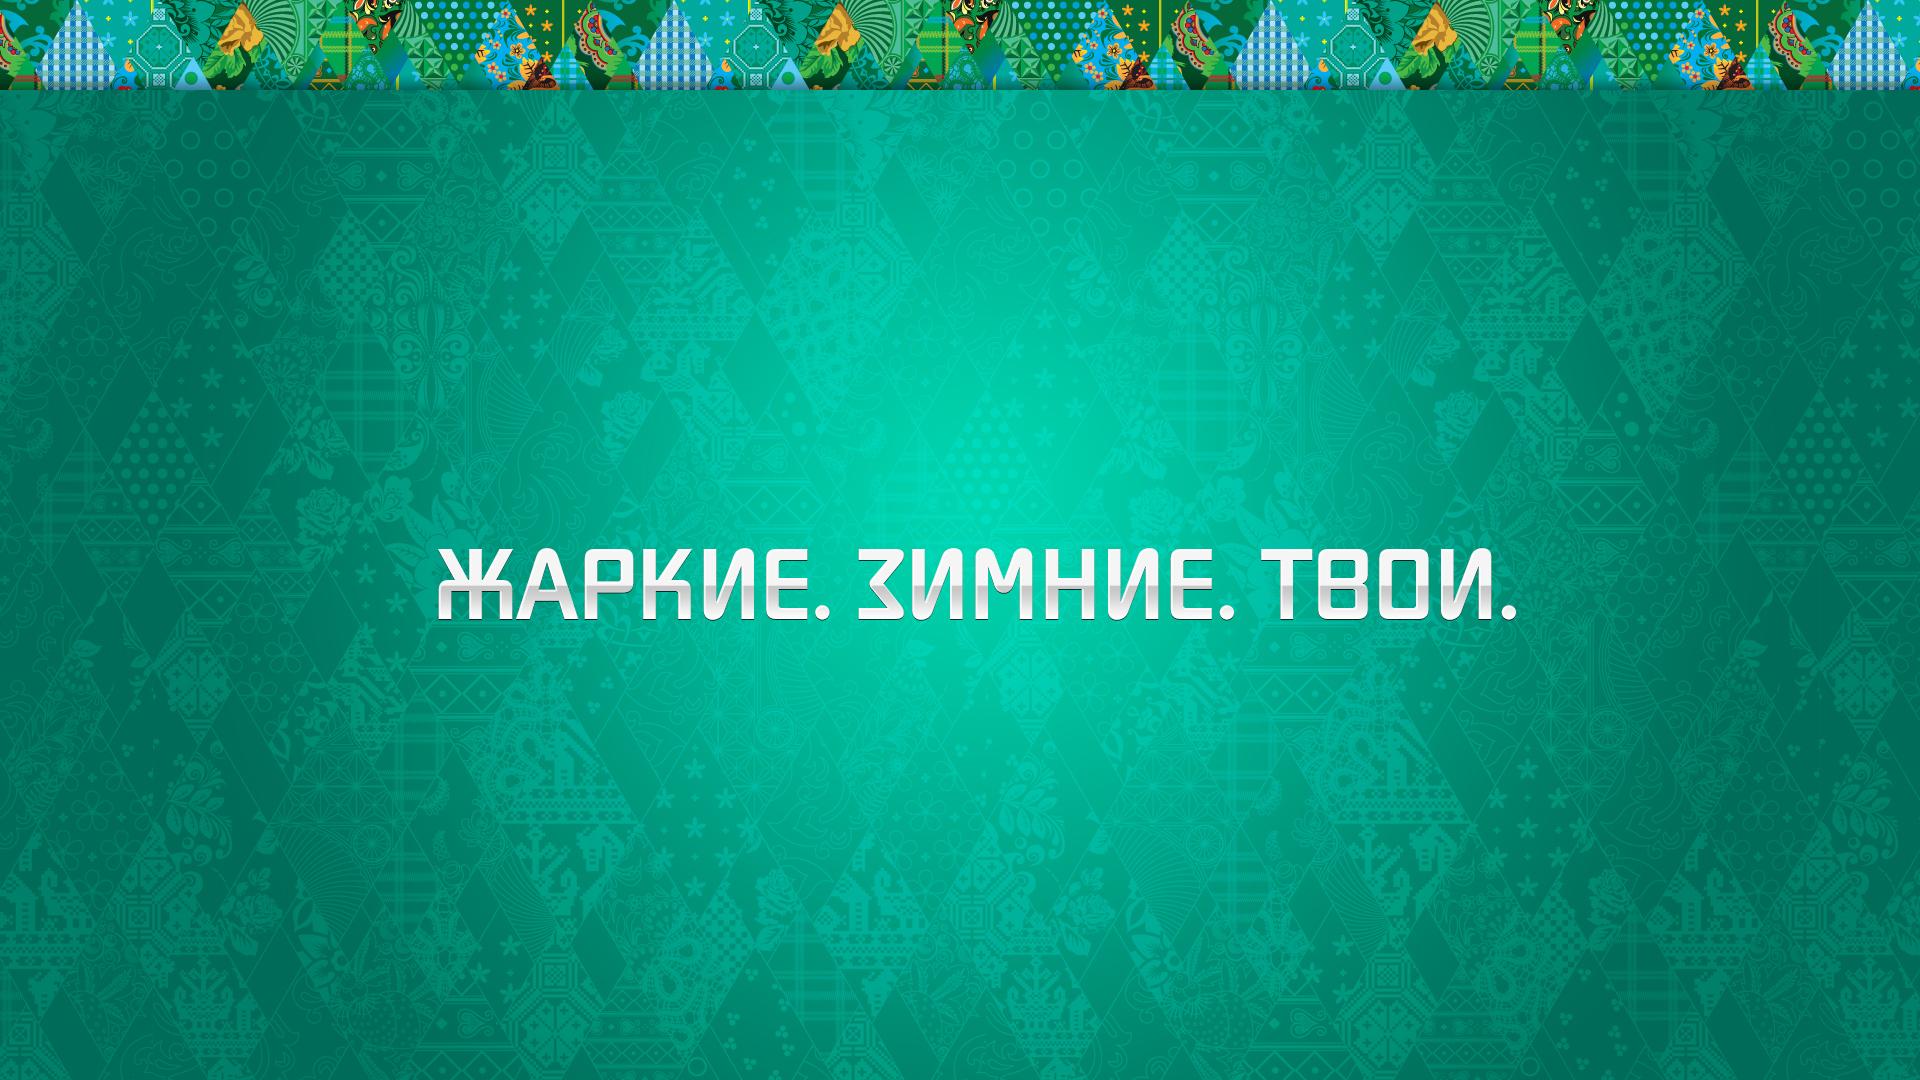 Winter Olympics 2014 In Sochi Light Sea Green Color